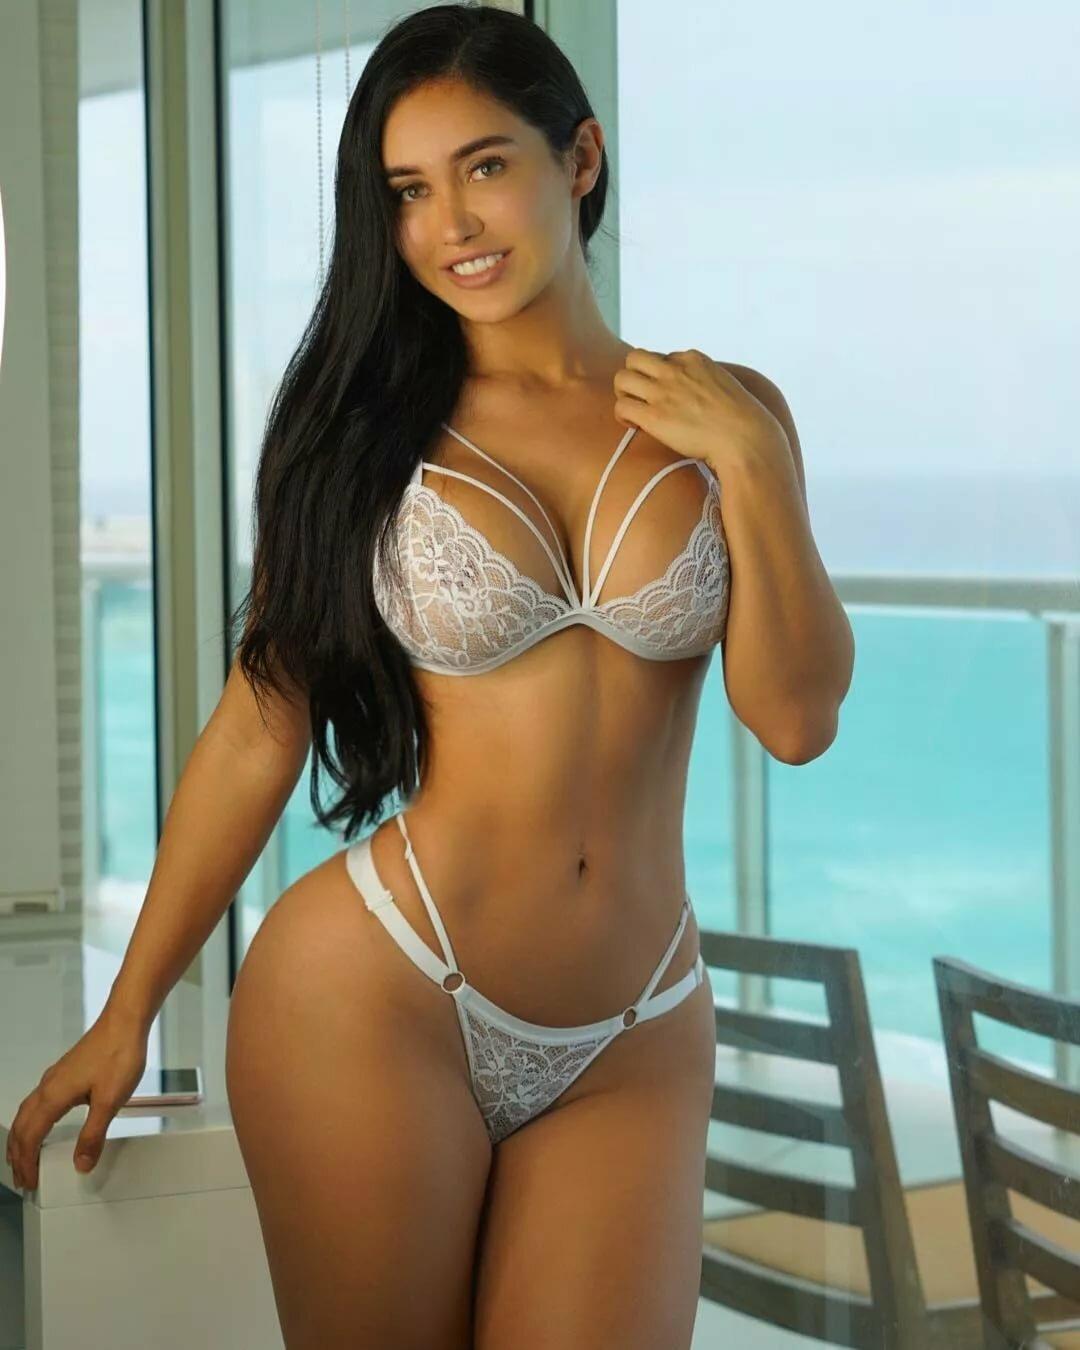 Bikini hot latina